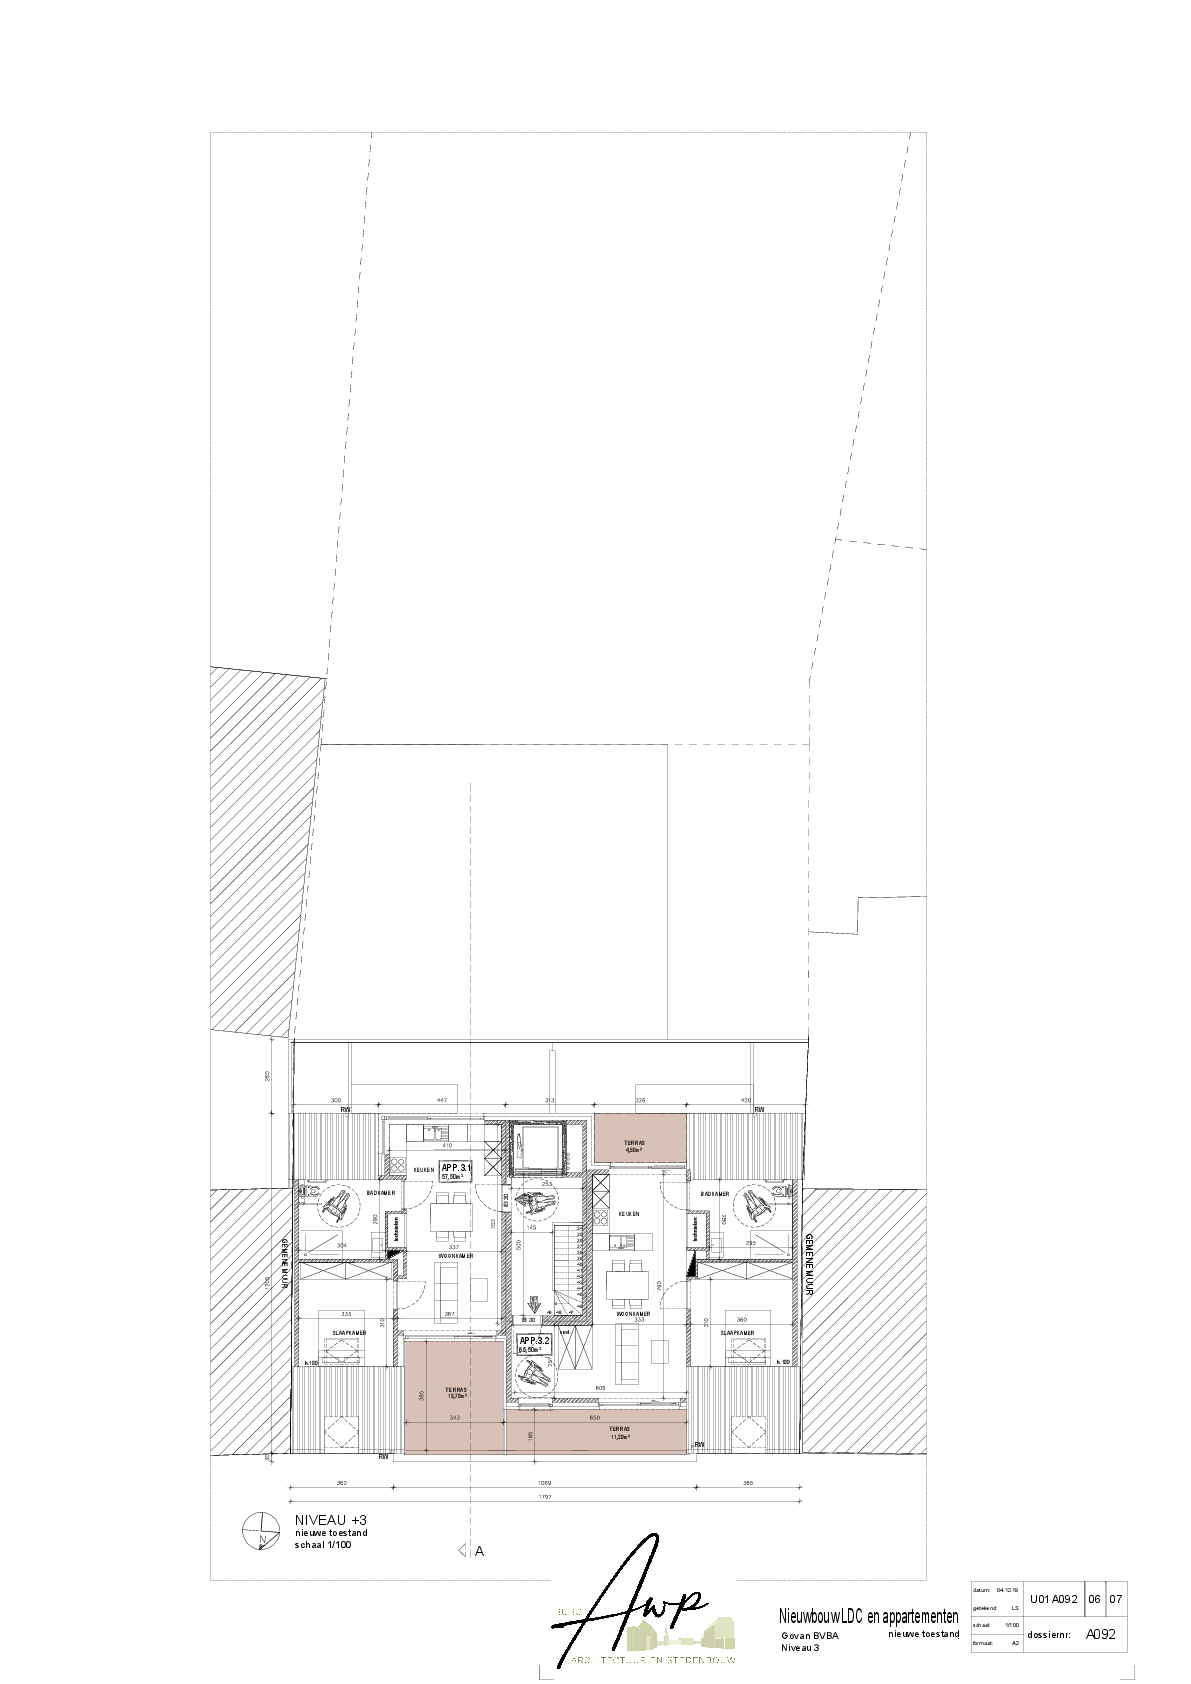 grondplan3.pdf